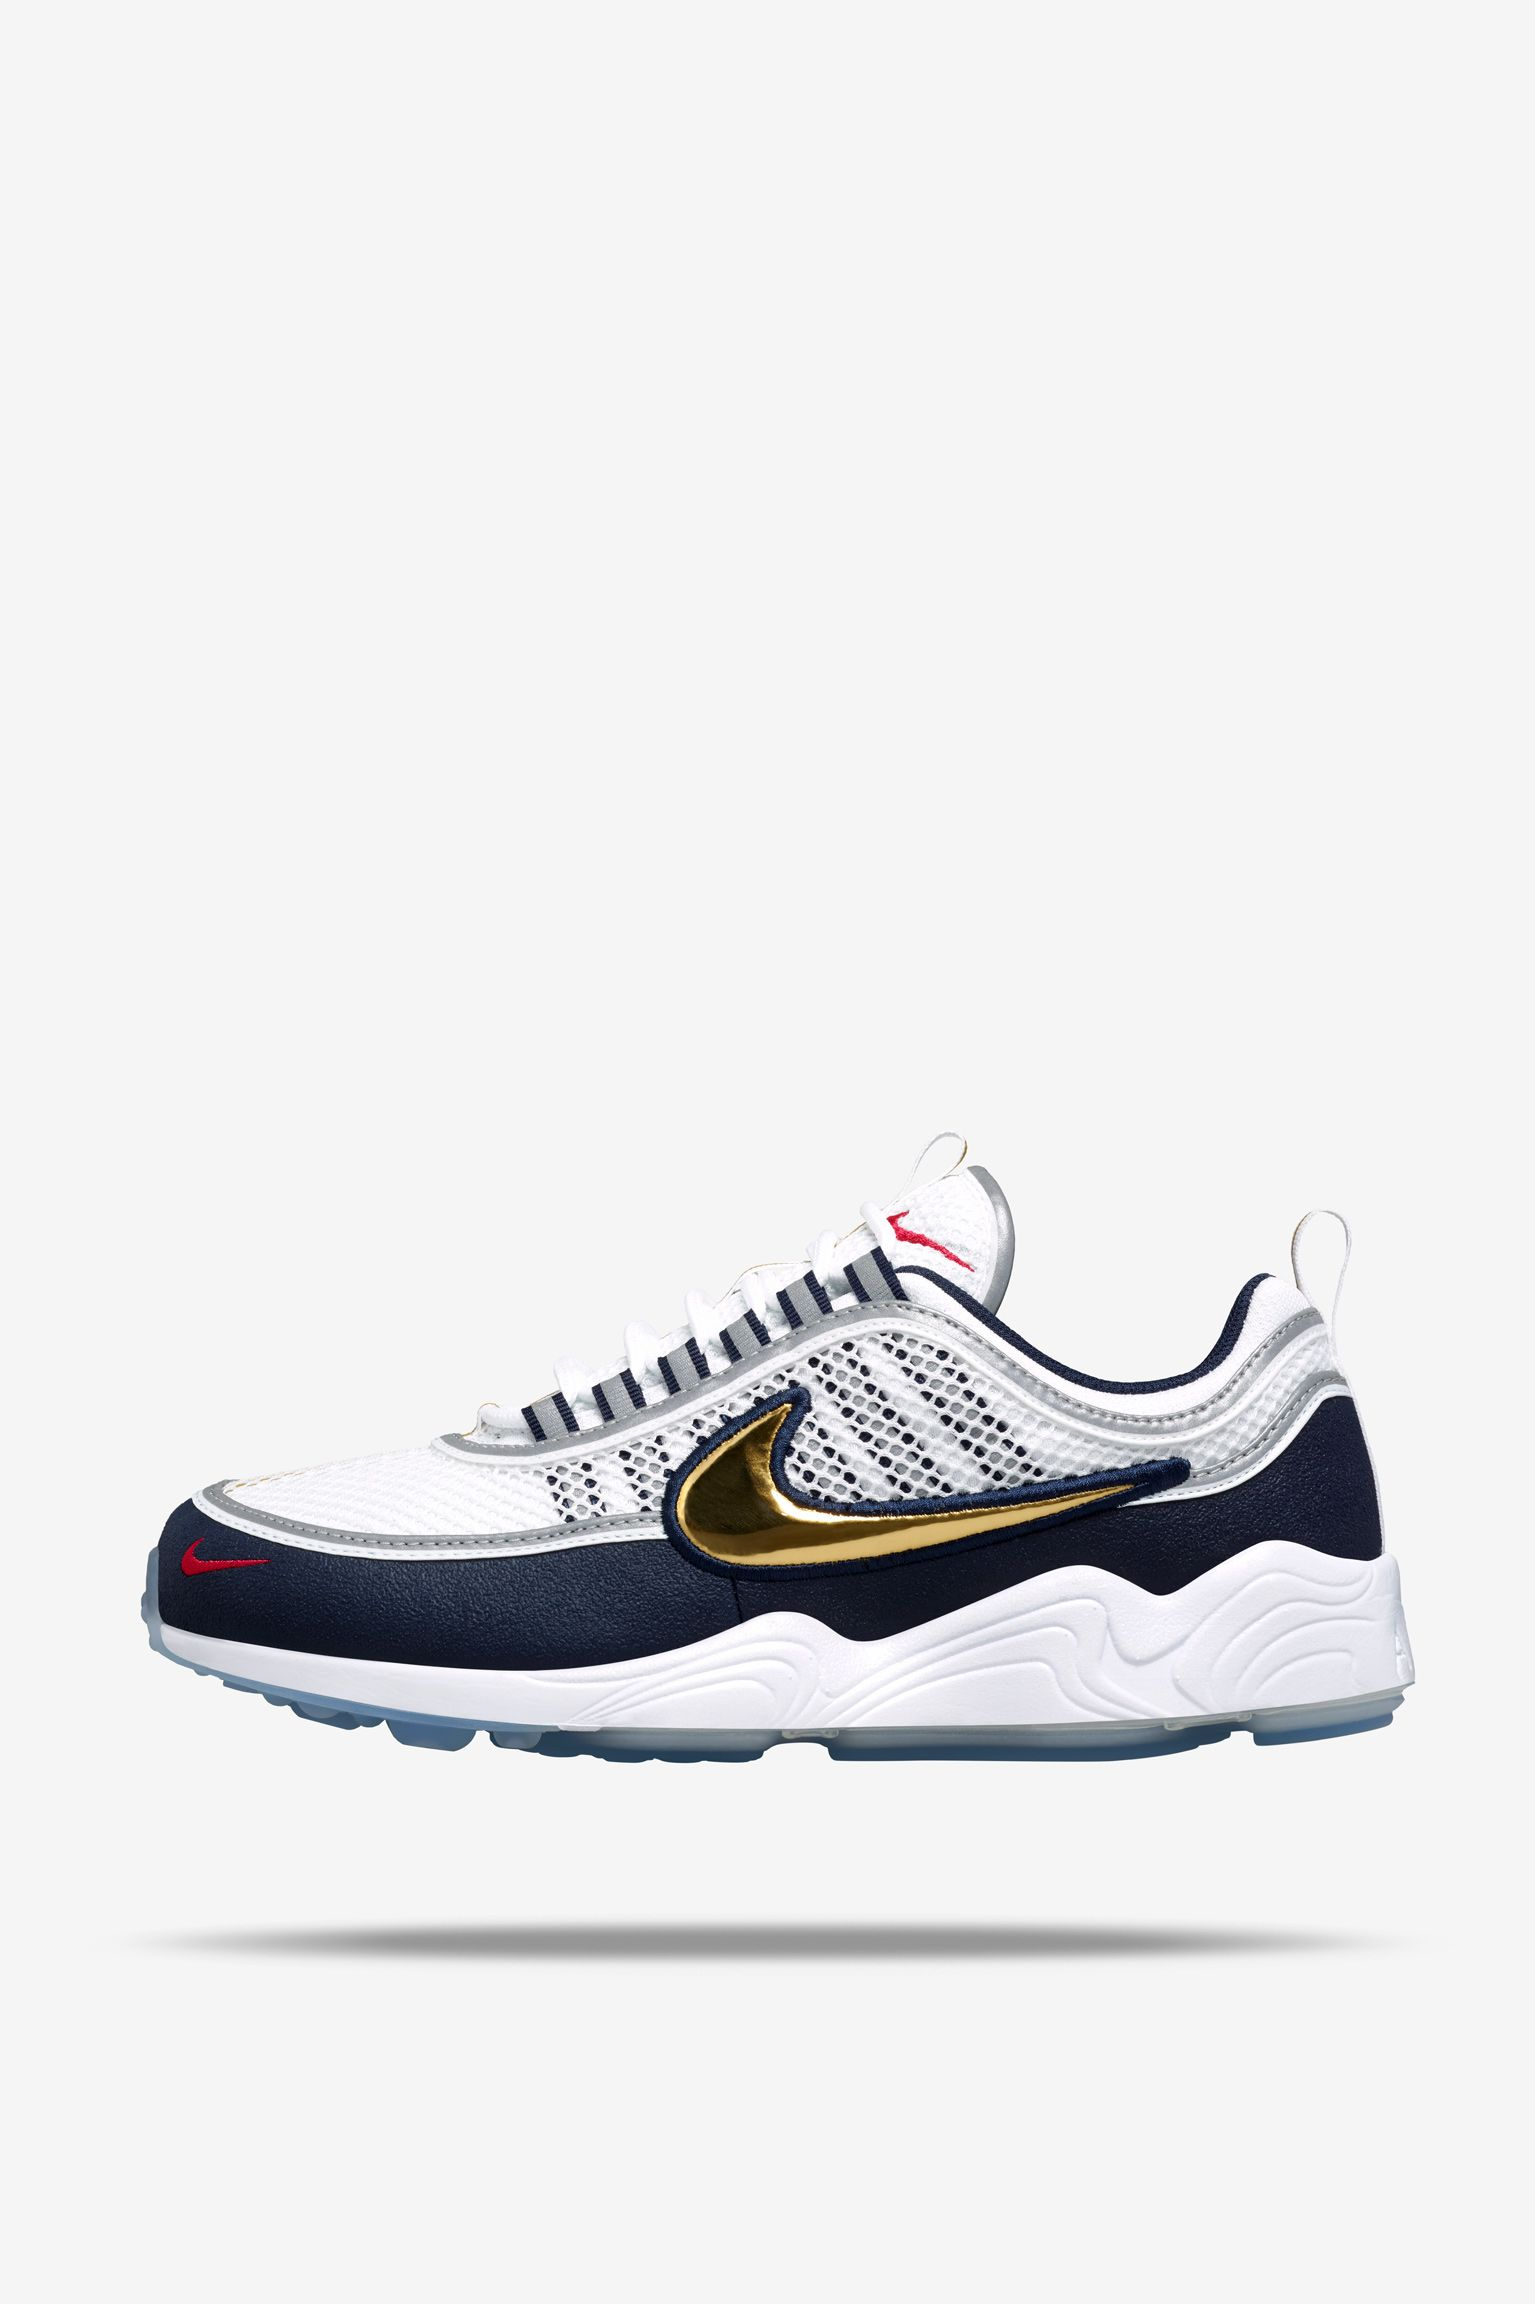 NikeLab Air Zoom Spiridon 'White & Gold' – datum uvedení na trh